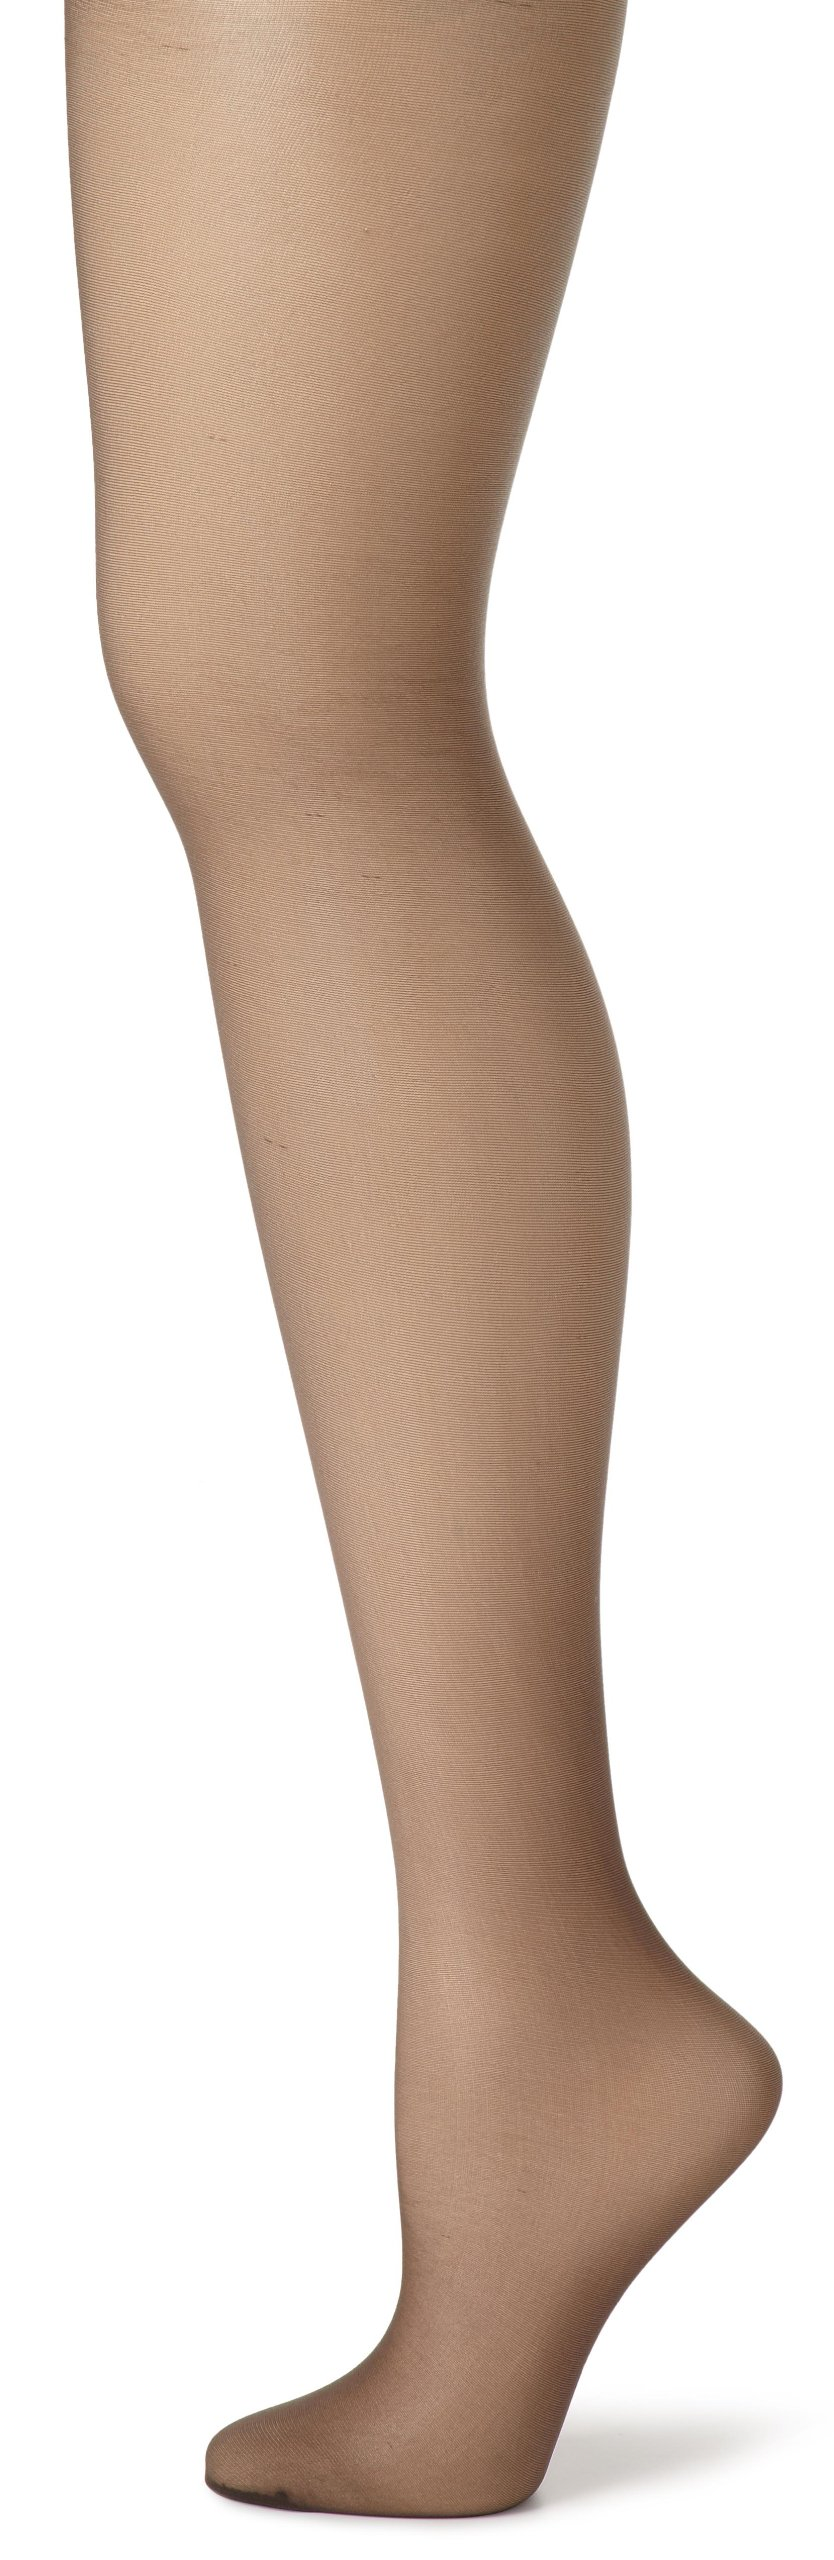 Hanes Women's Control Top Sheer Toe Silk Reflections Panty Hose, Barely Black A/B